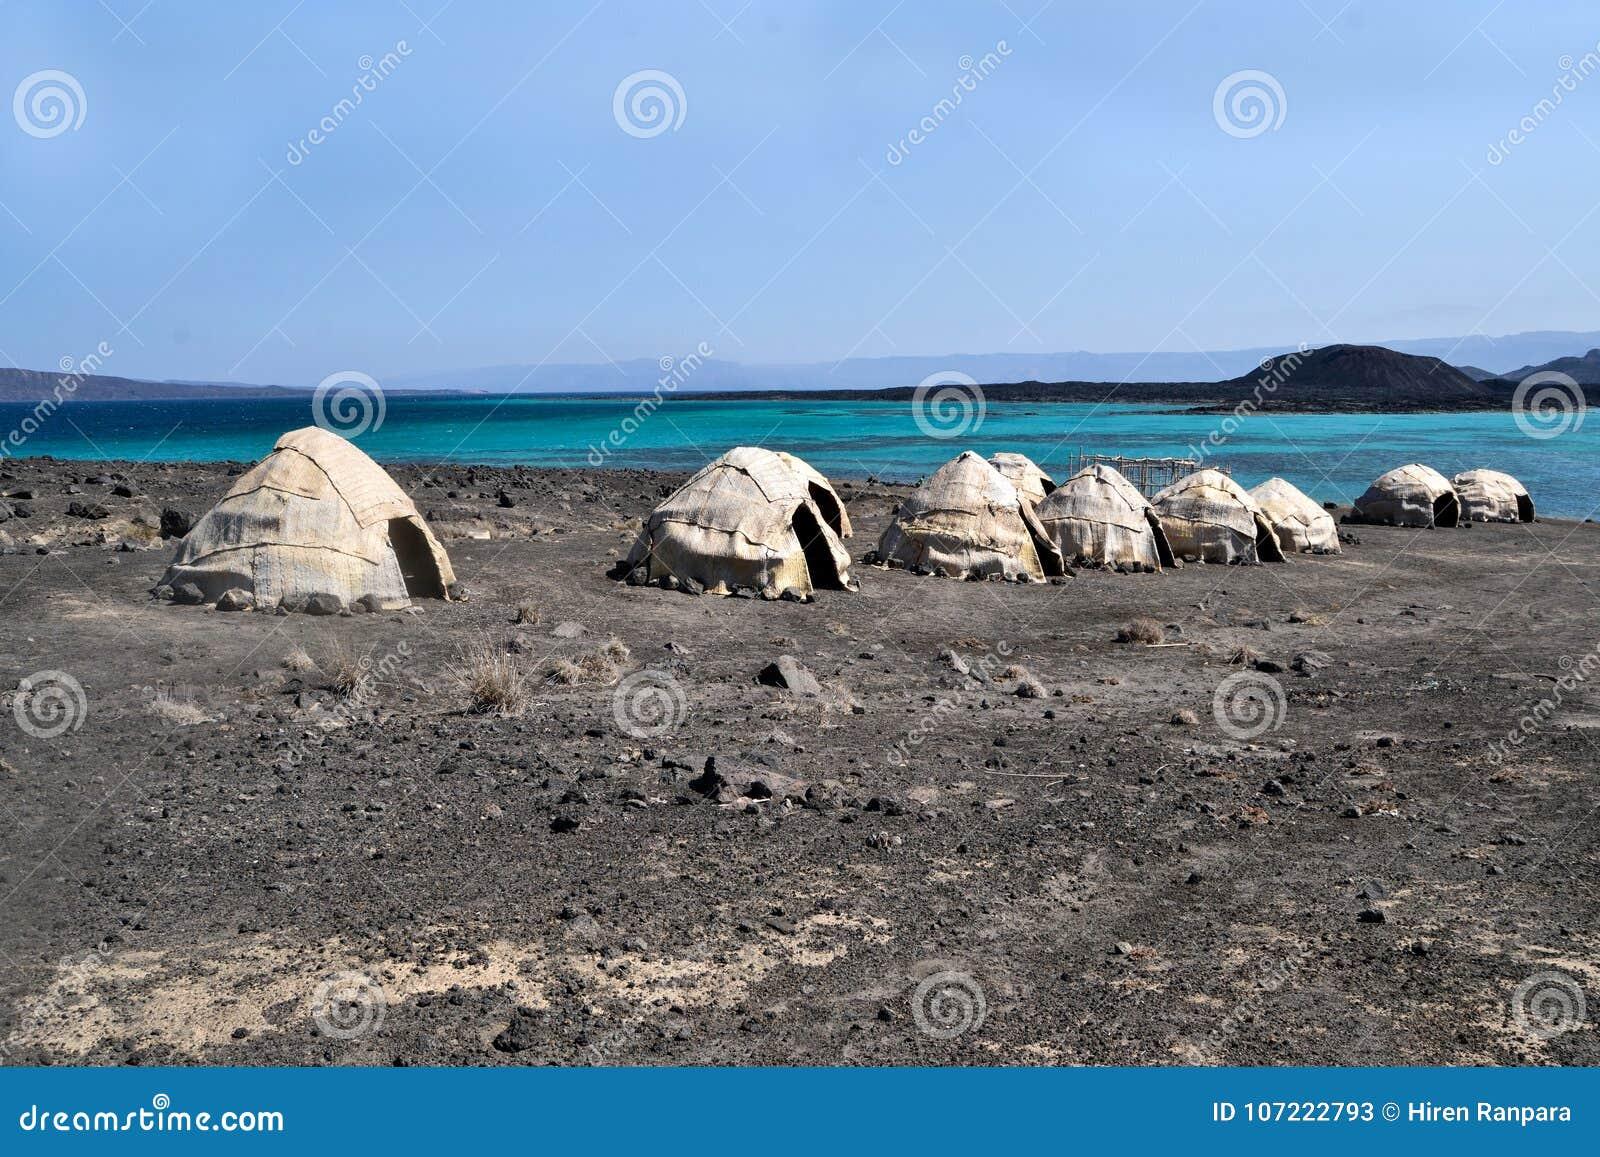 afar tents huts ghoubet beach devils island ghoubbet el kharab